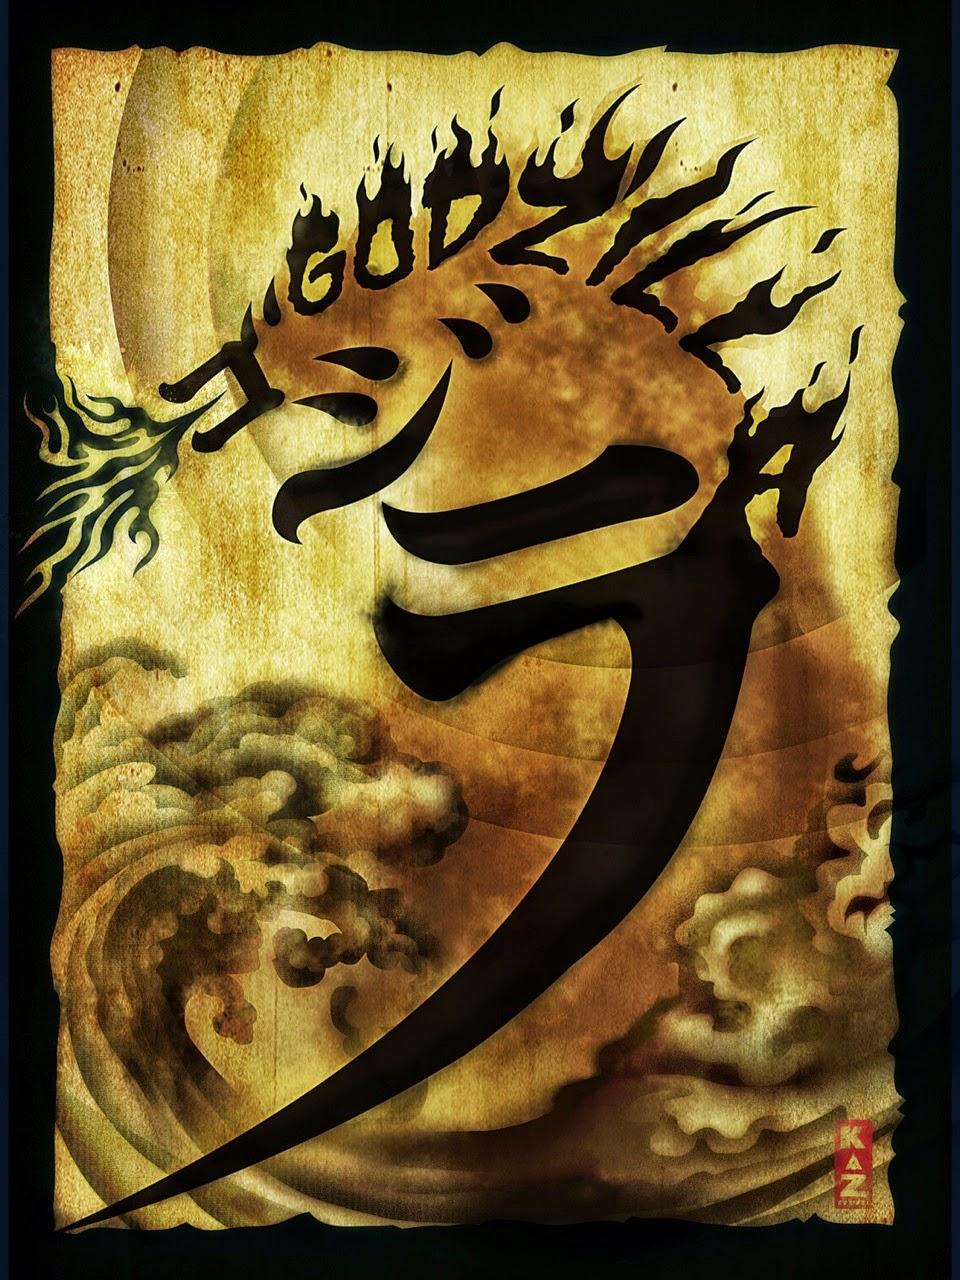 The Geeky Nerfherder: Movie Poster Art: \'Godzilla\' (2014)